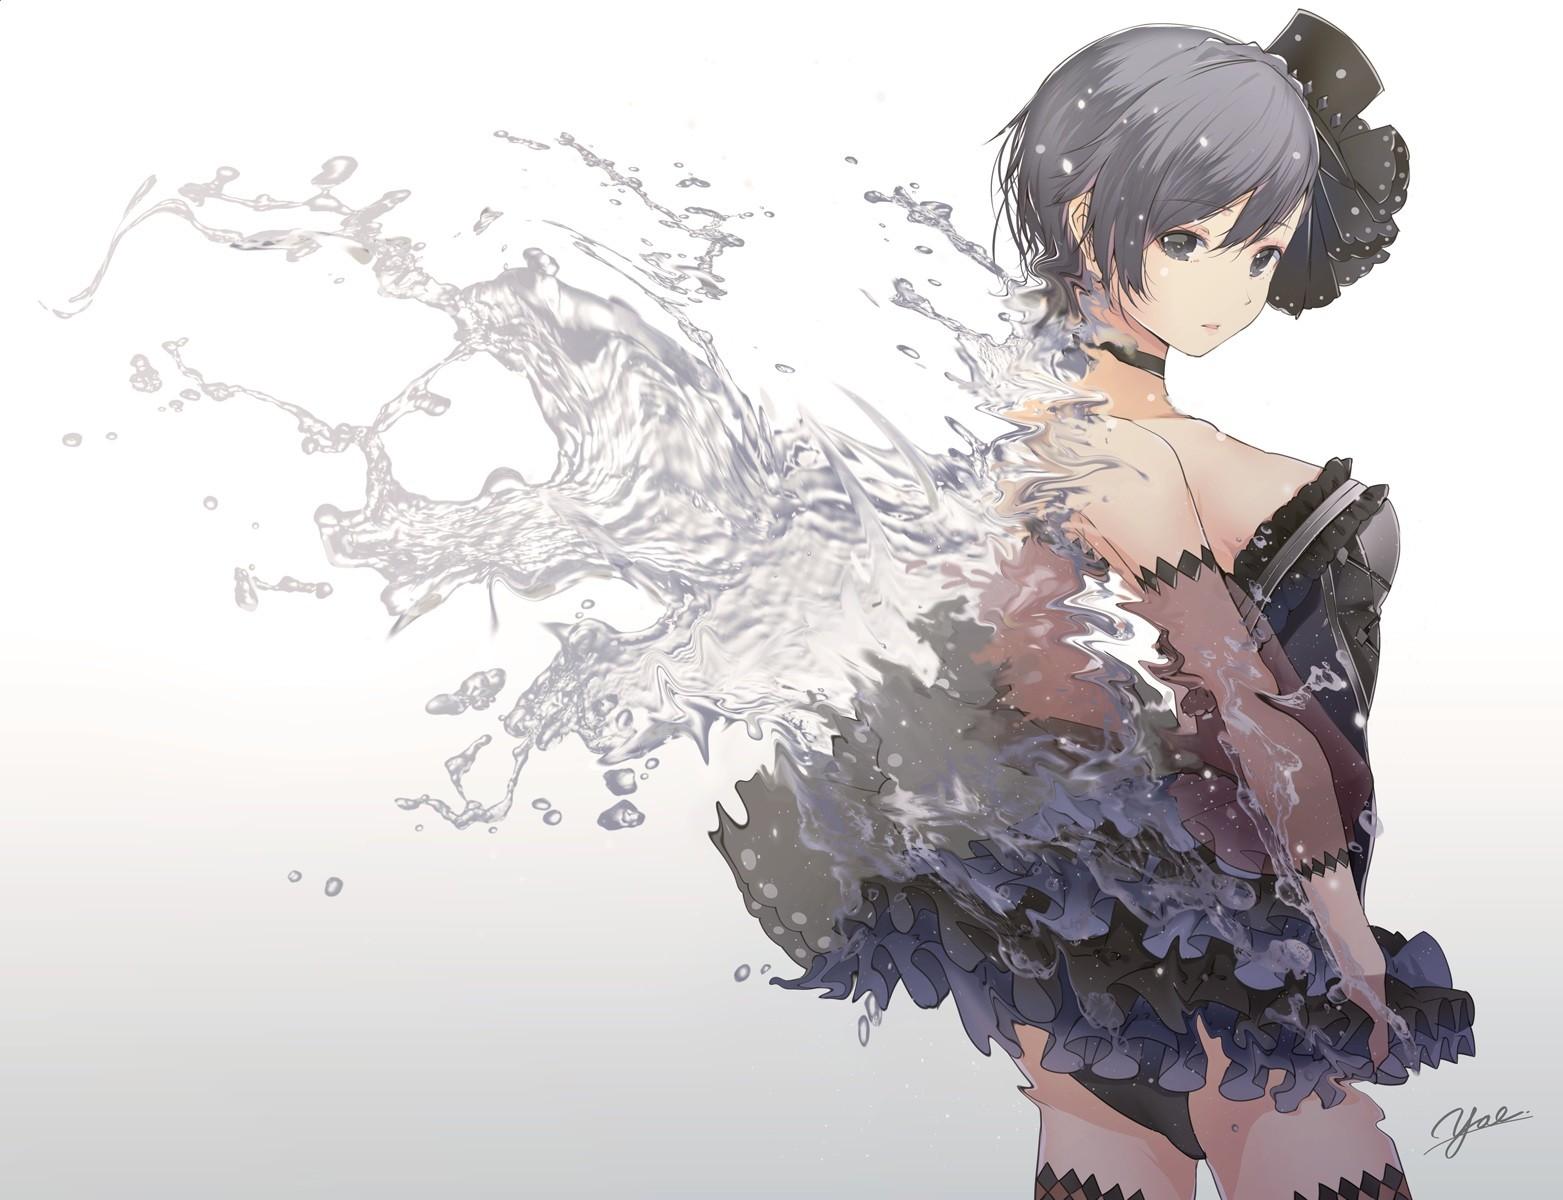 Wallpaper Drawing Illustration Choker Anime Girls Water